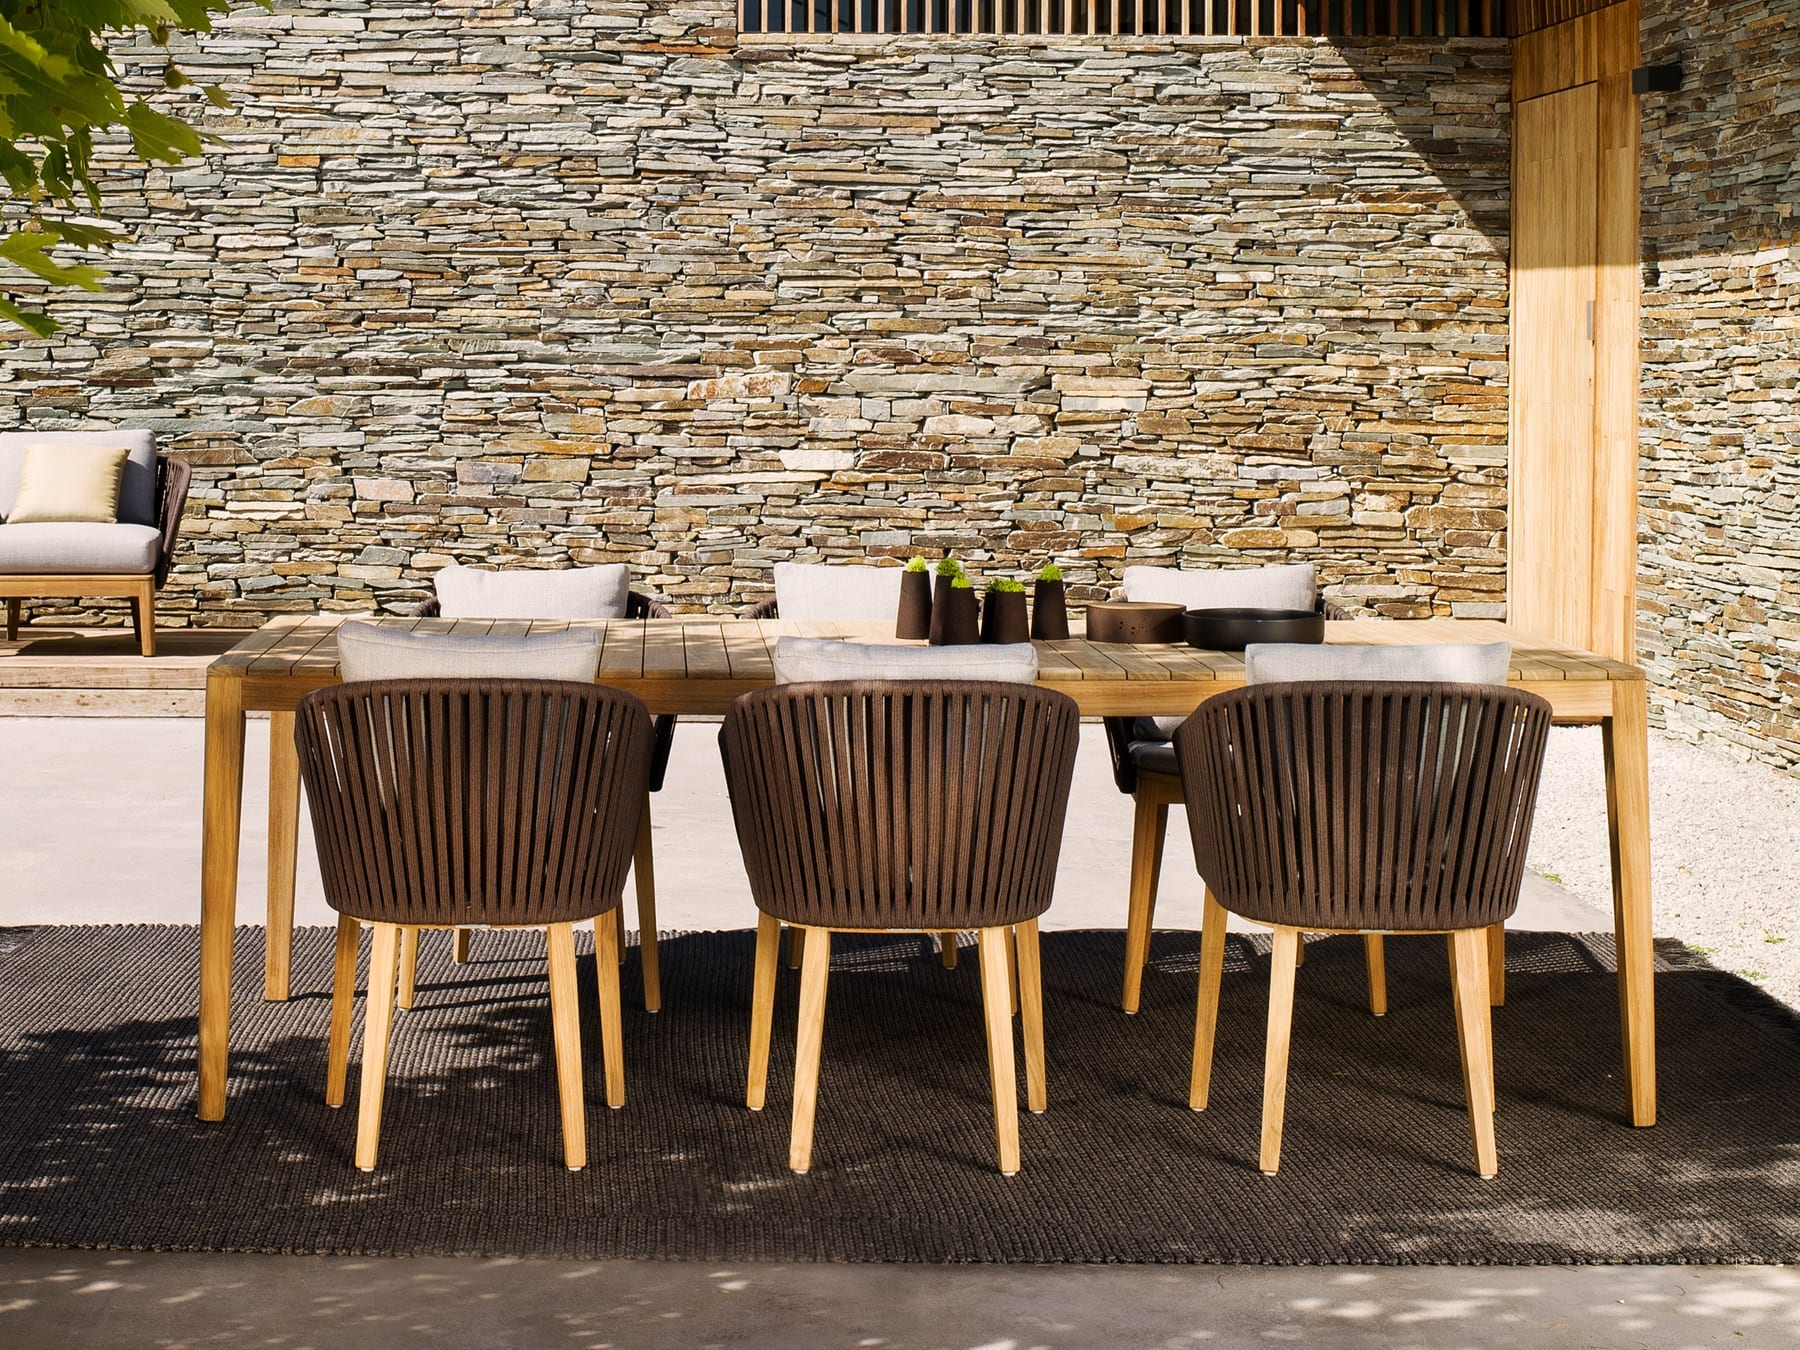 dining furniture christchurch nz images